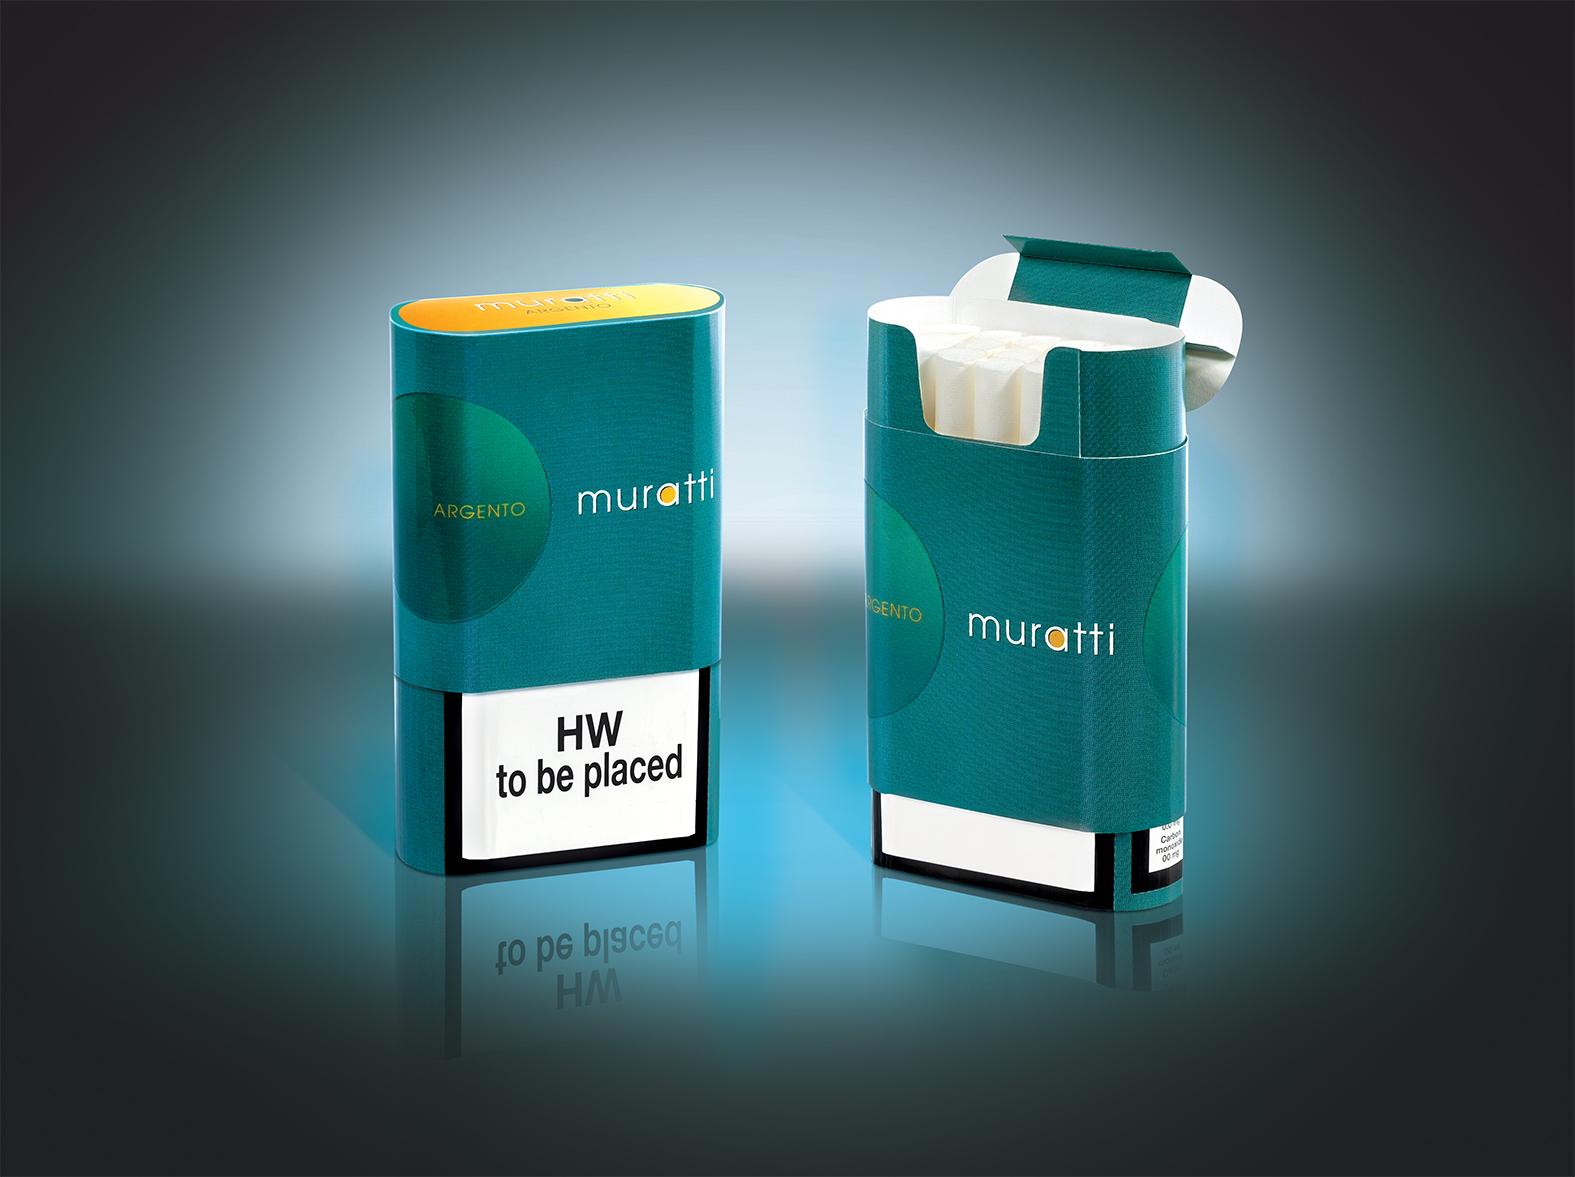 Muratti-argento-vert-10(compo-web).jpg